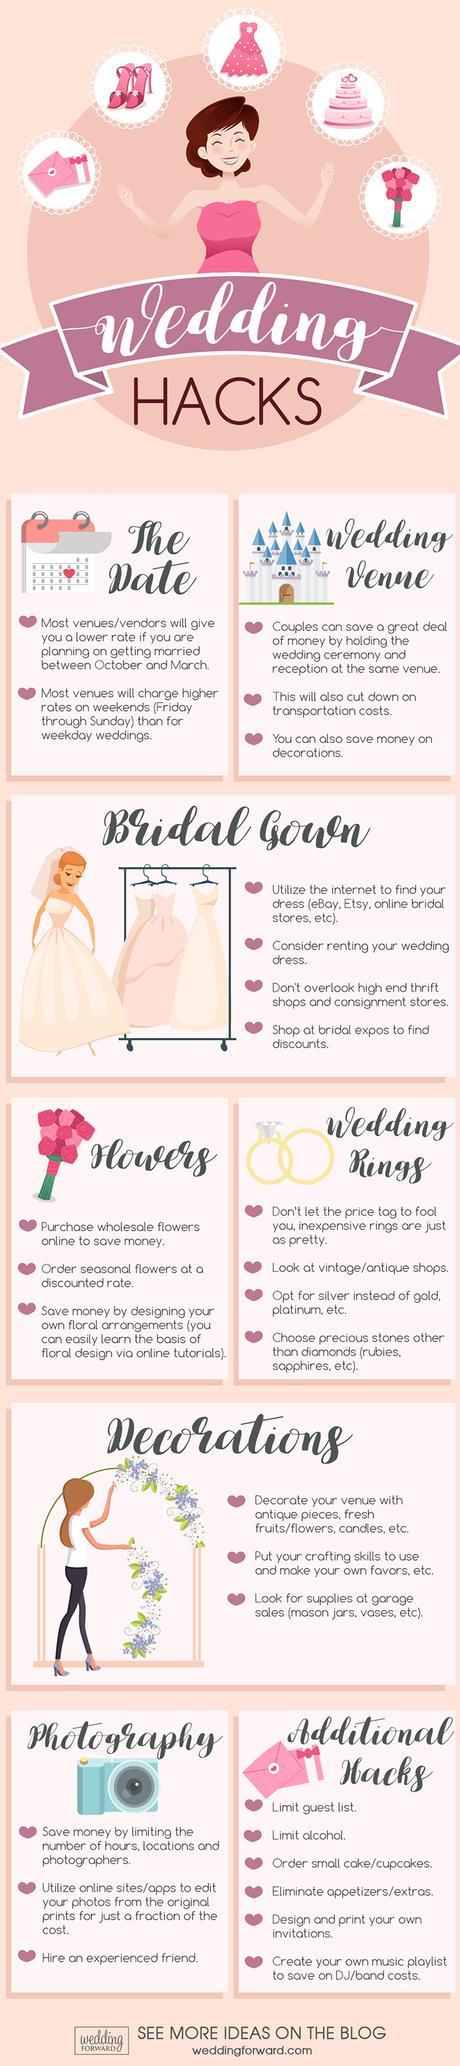 cheap wedding hacks infographic ideas